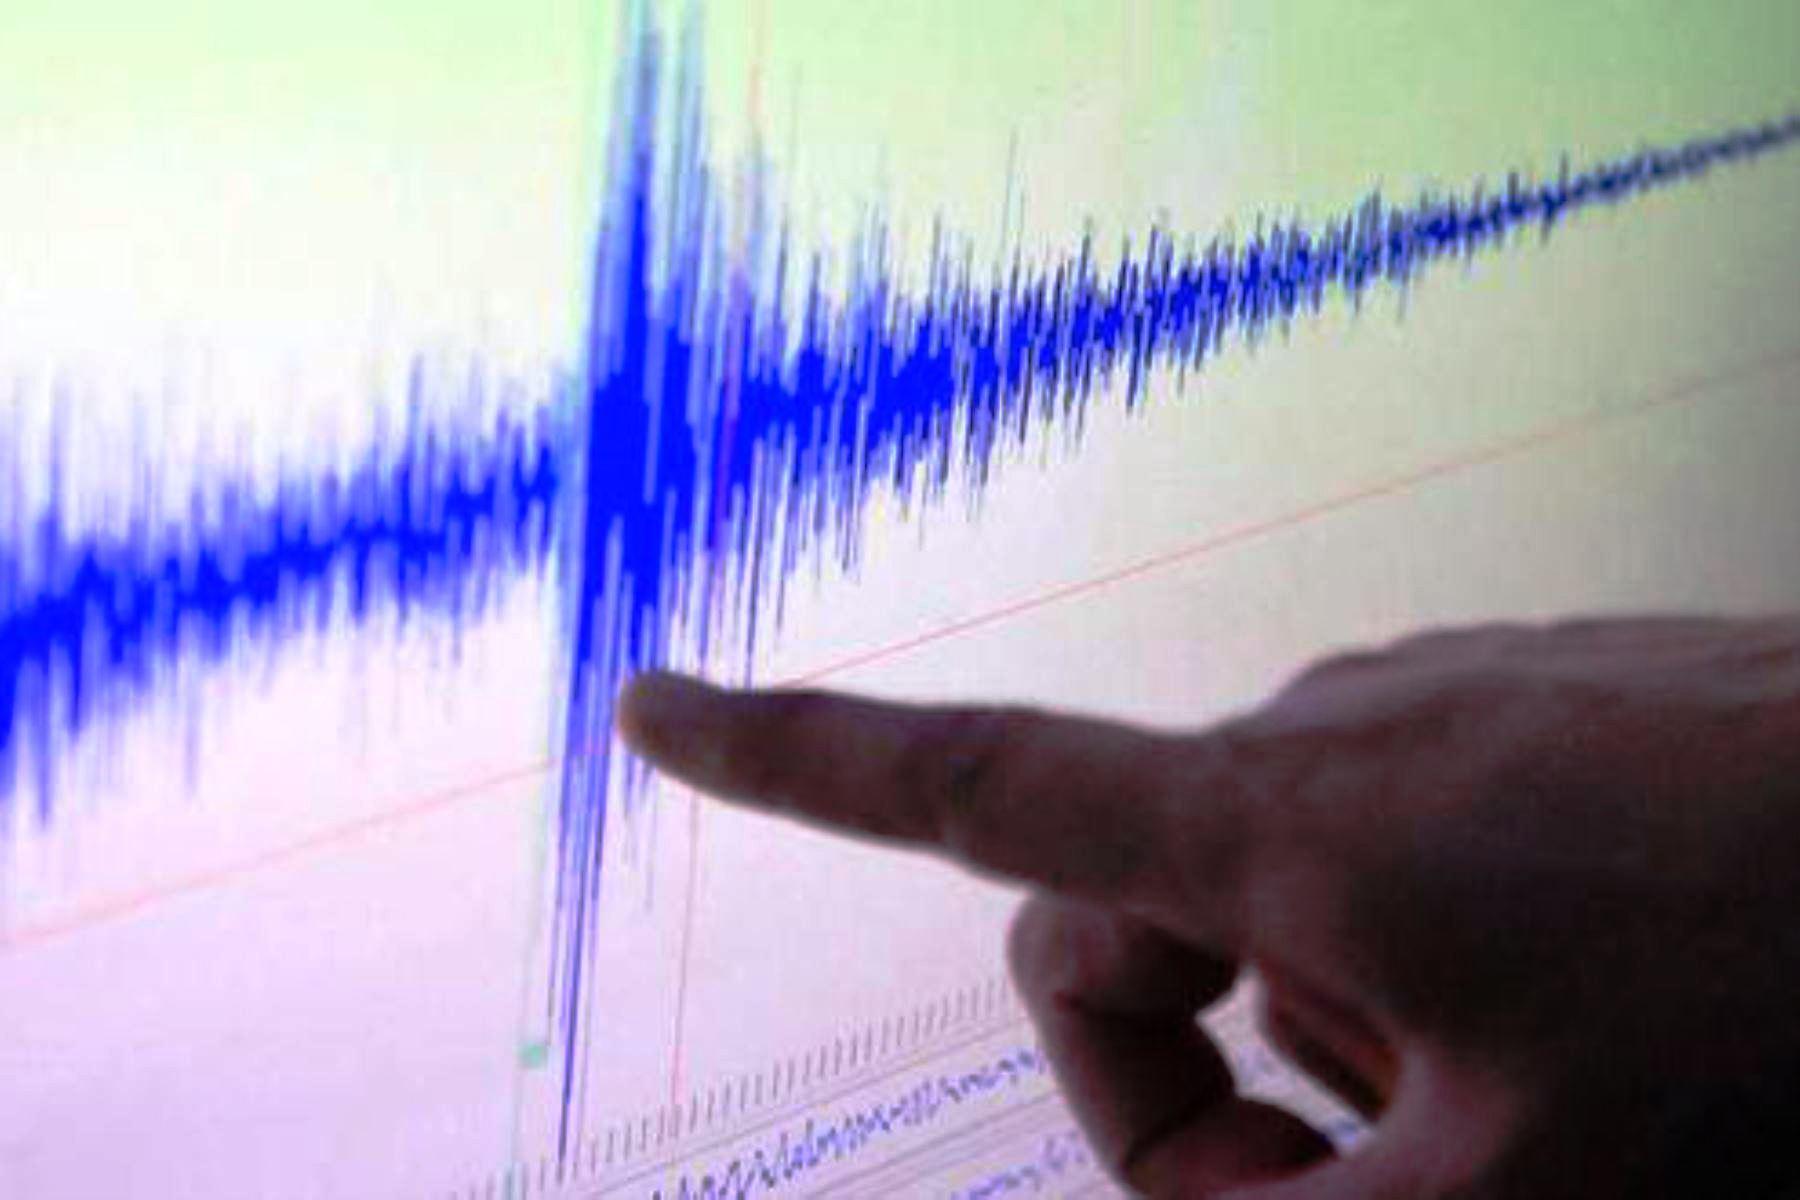 Sismo de magnitud 3.6 se registró esta mañana al sur de Lima